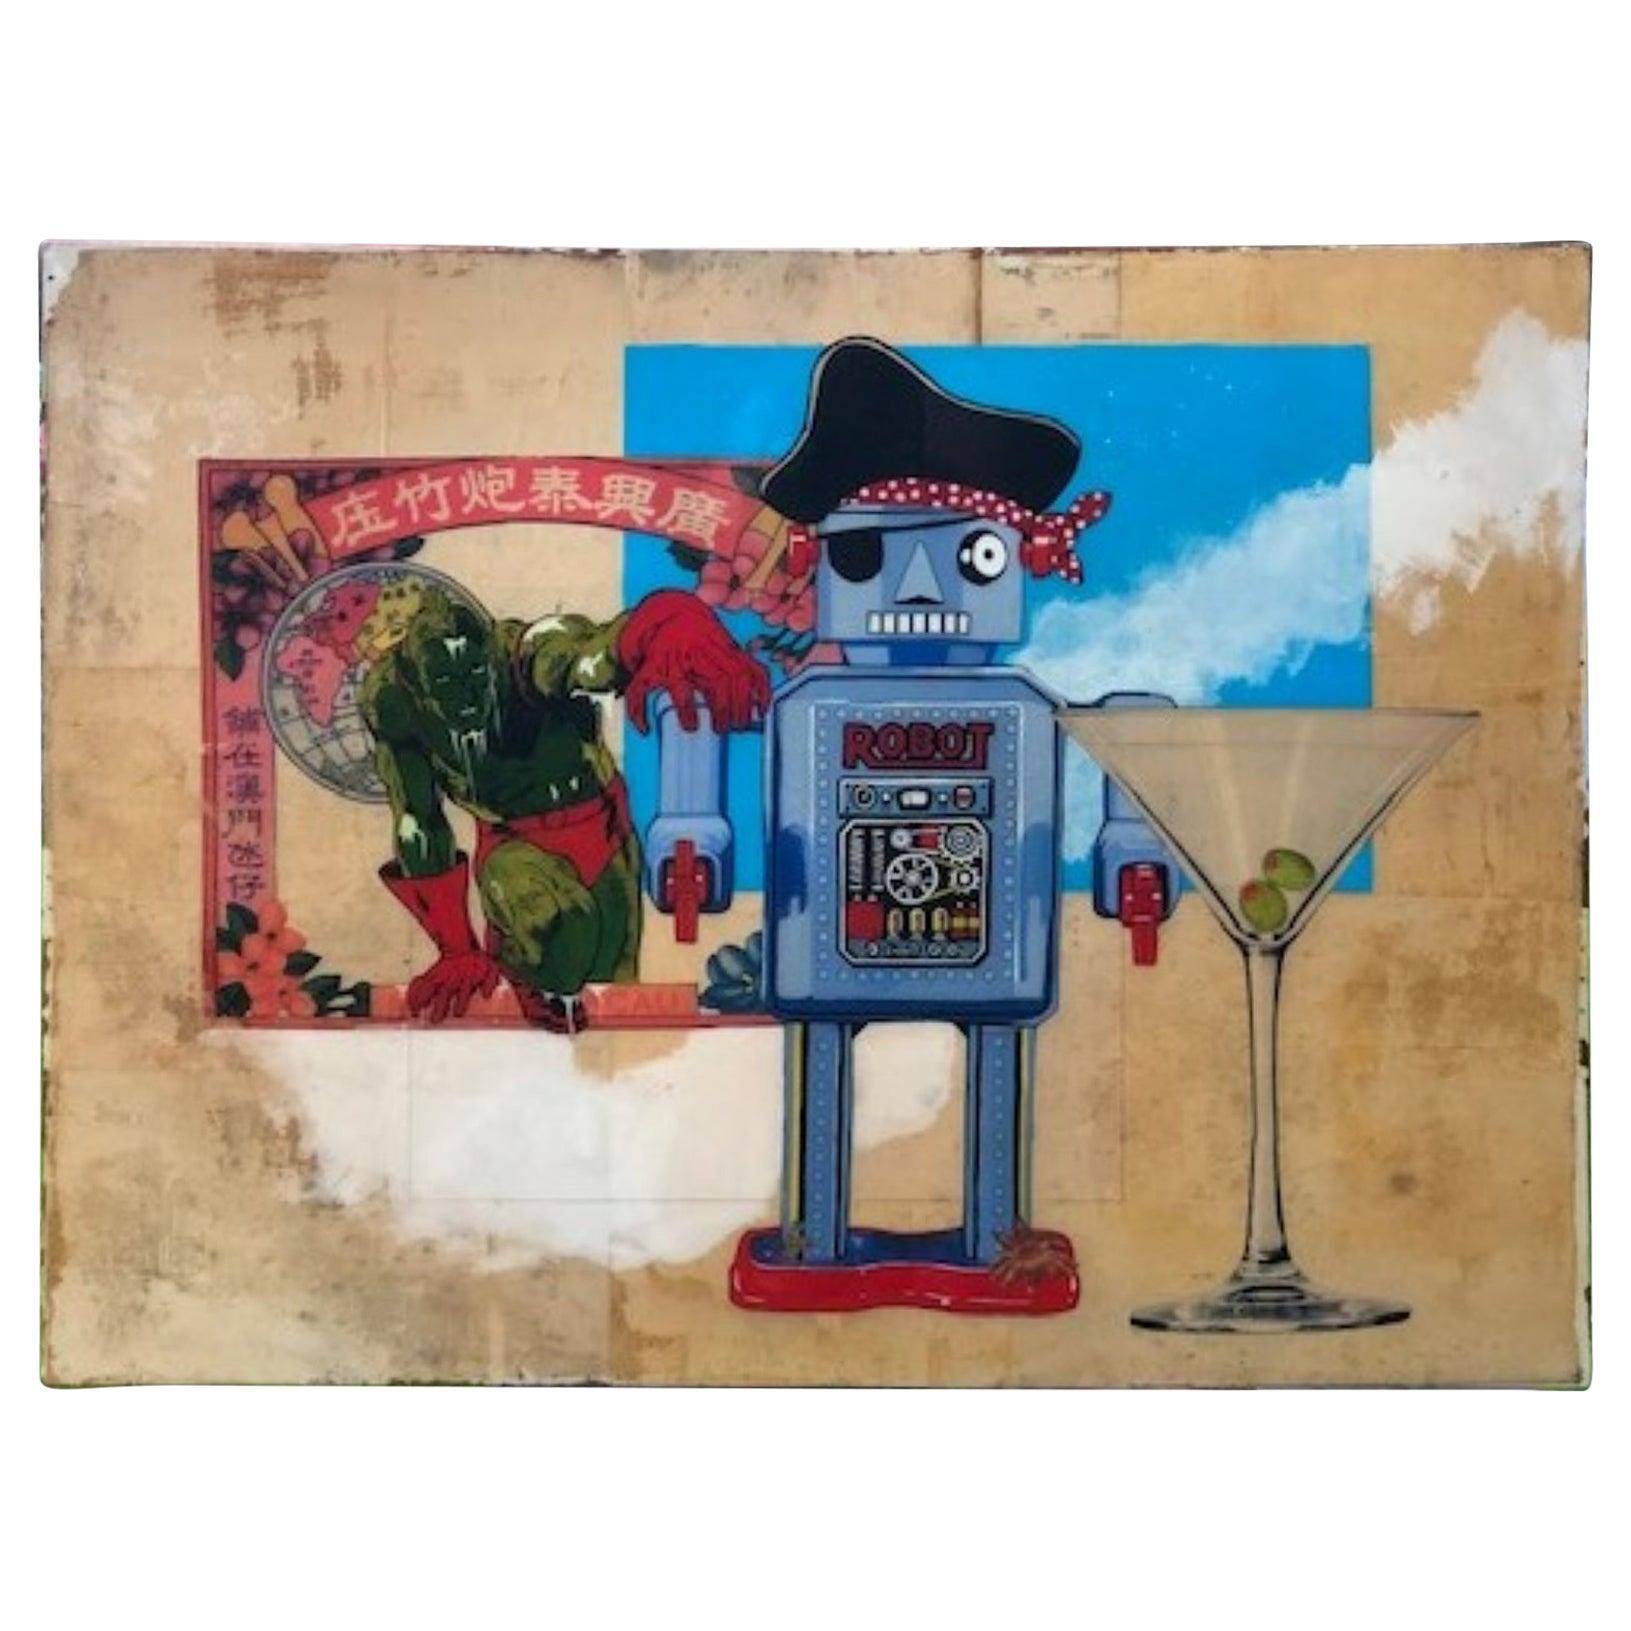 Original Artwork by Michael Mew 'Making New Friends', Mixed Media 2008